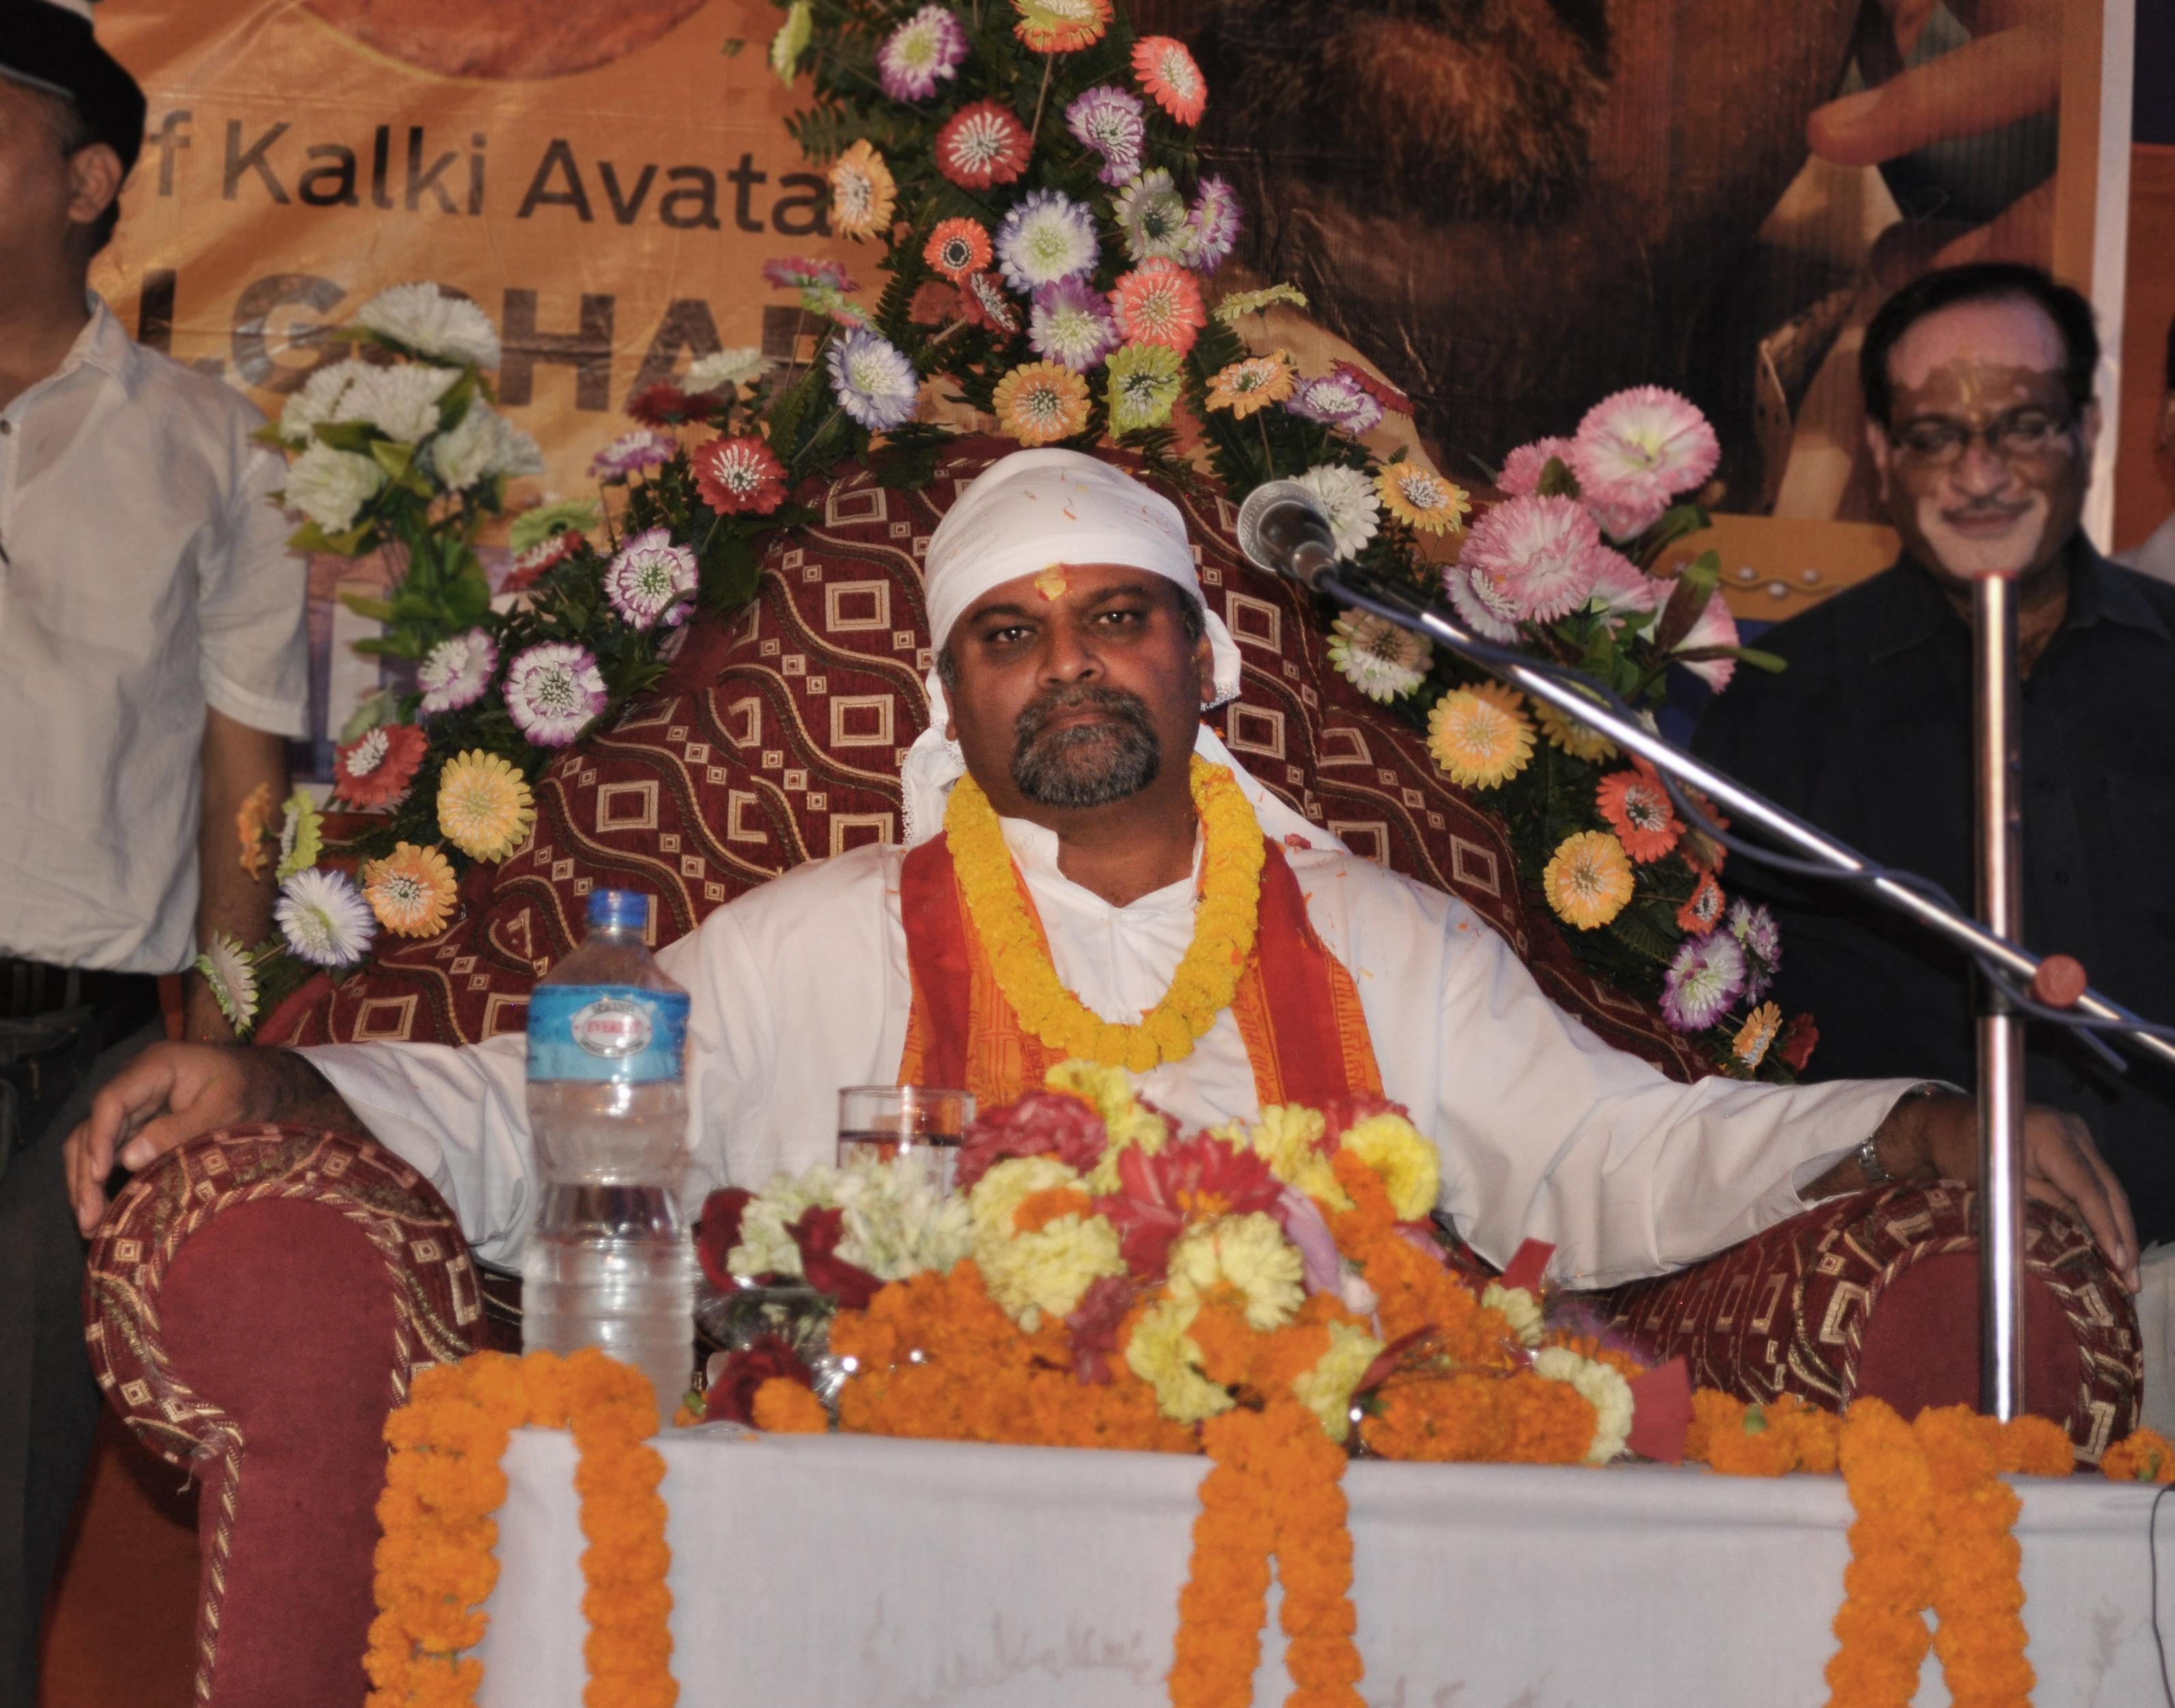 Kalki Avatar 2012 Of kalki avatar lord raKalki Avatar 2012